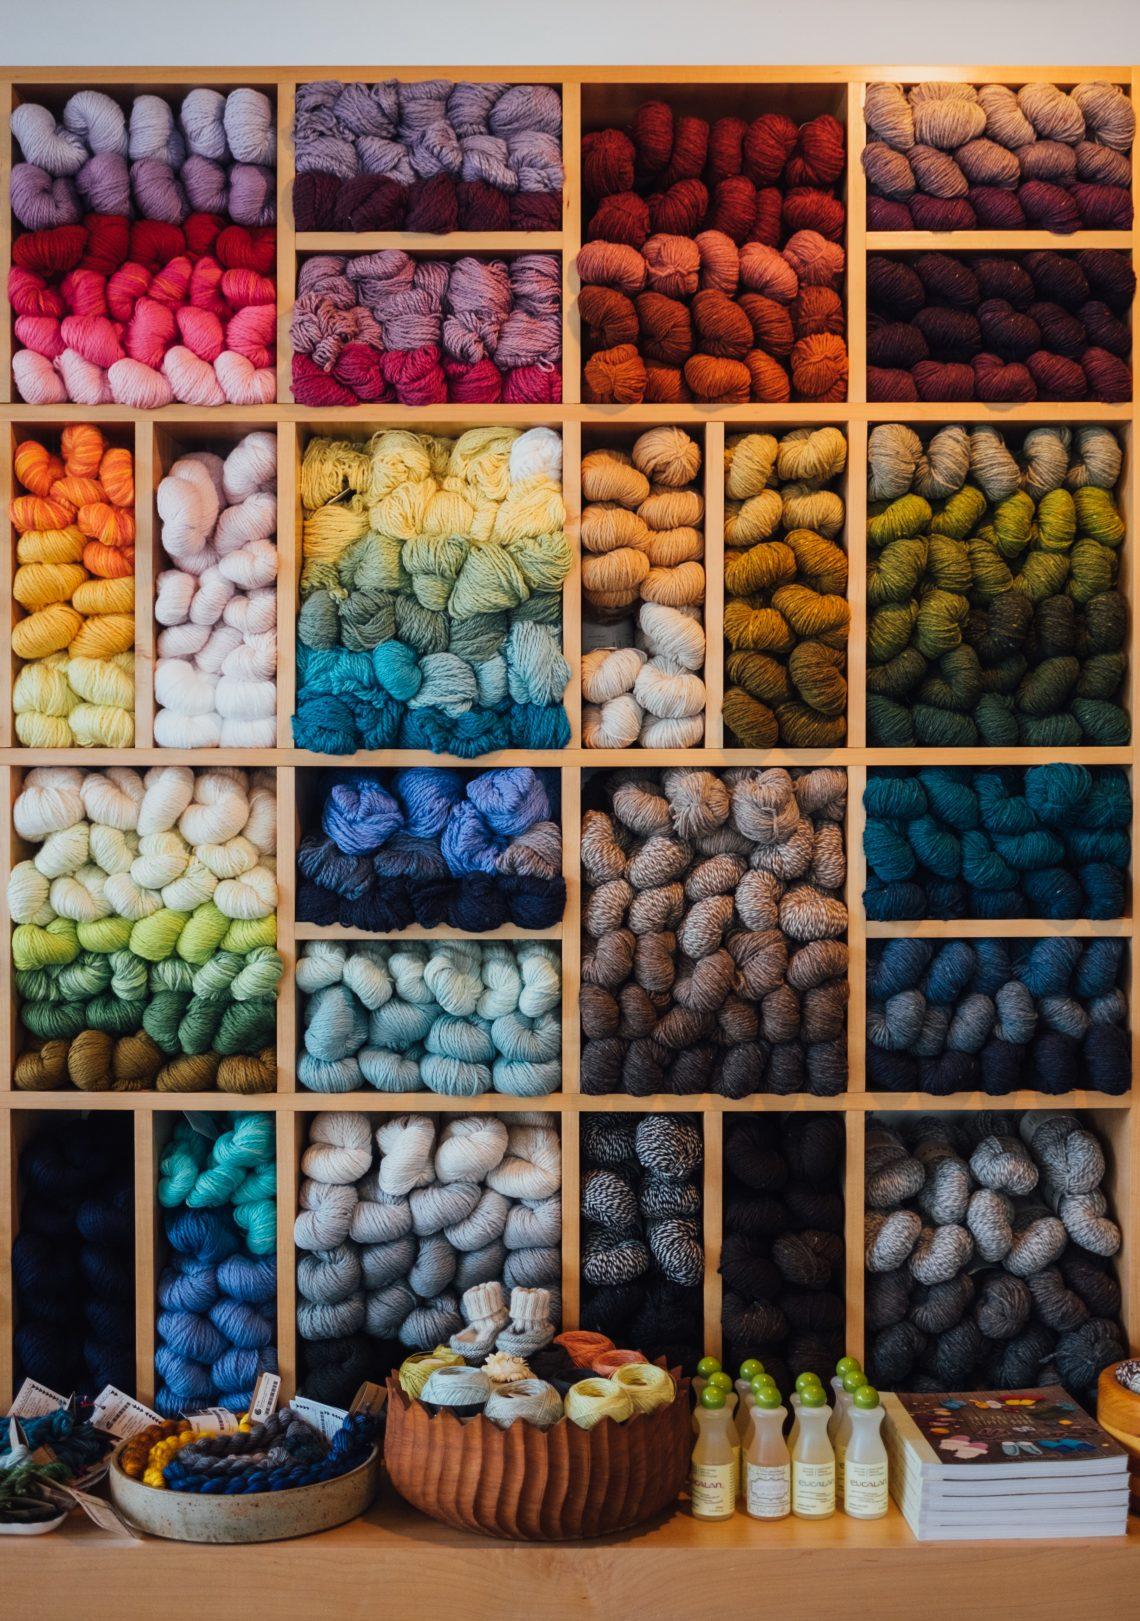 hvad betyder crochet